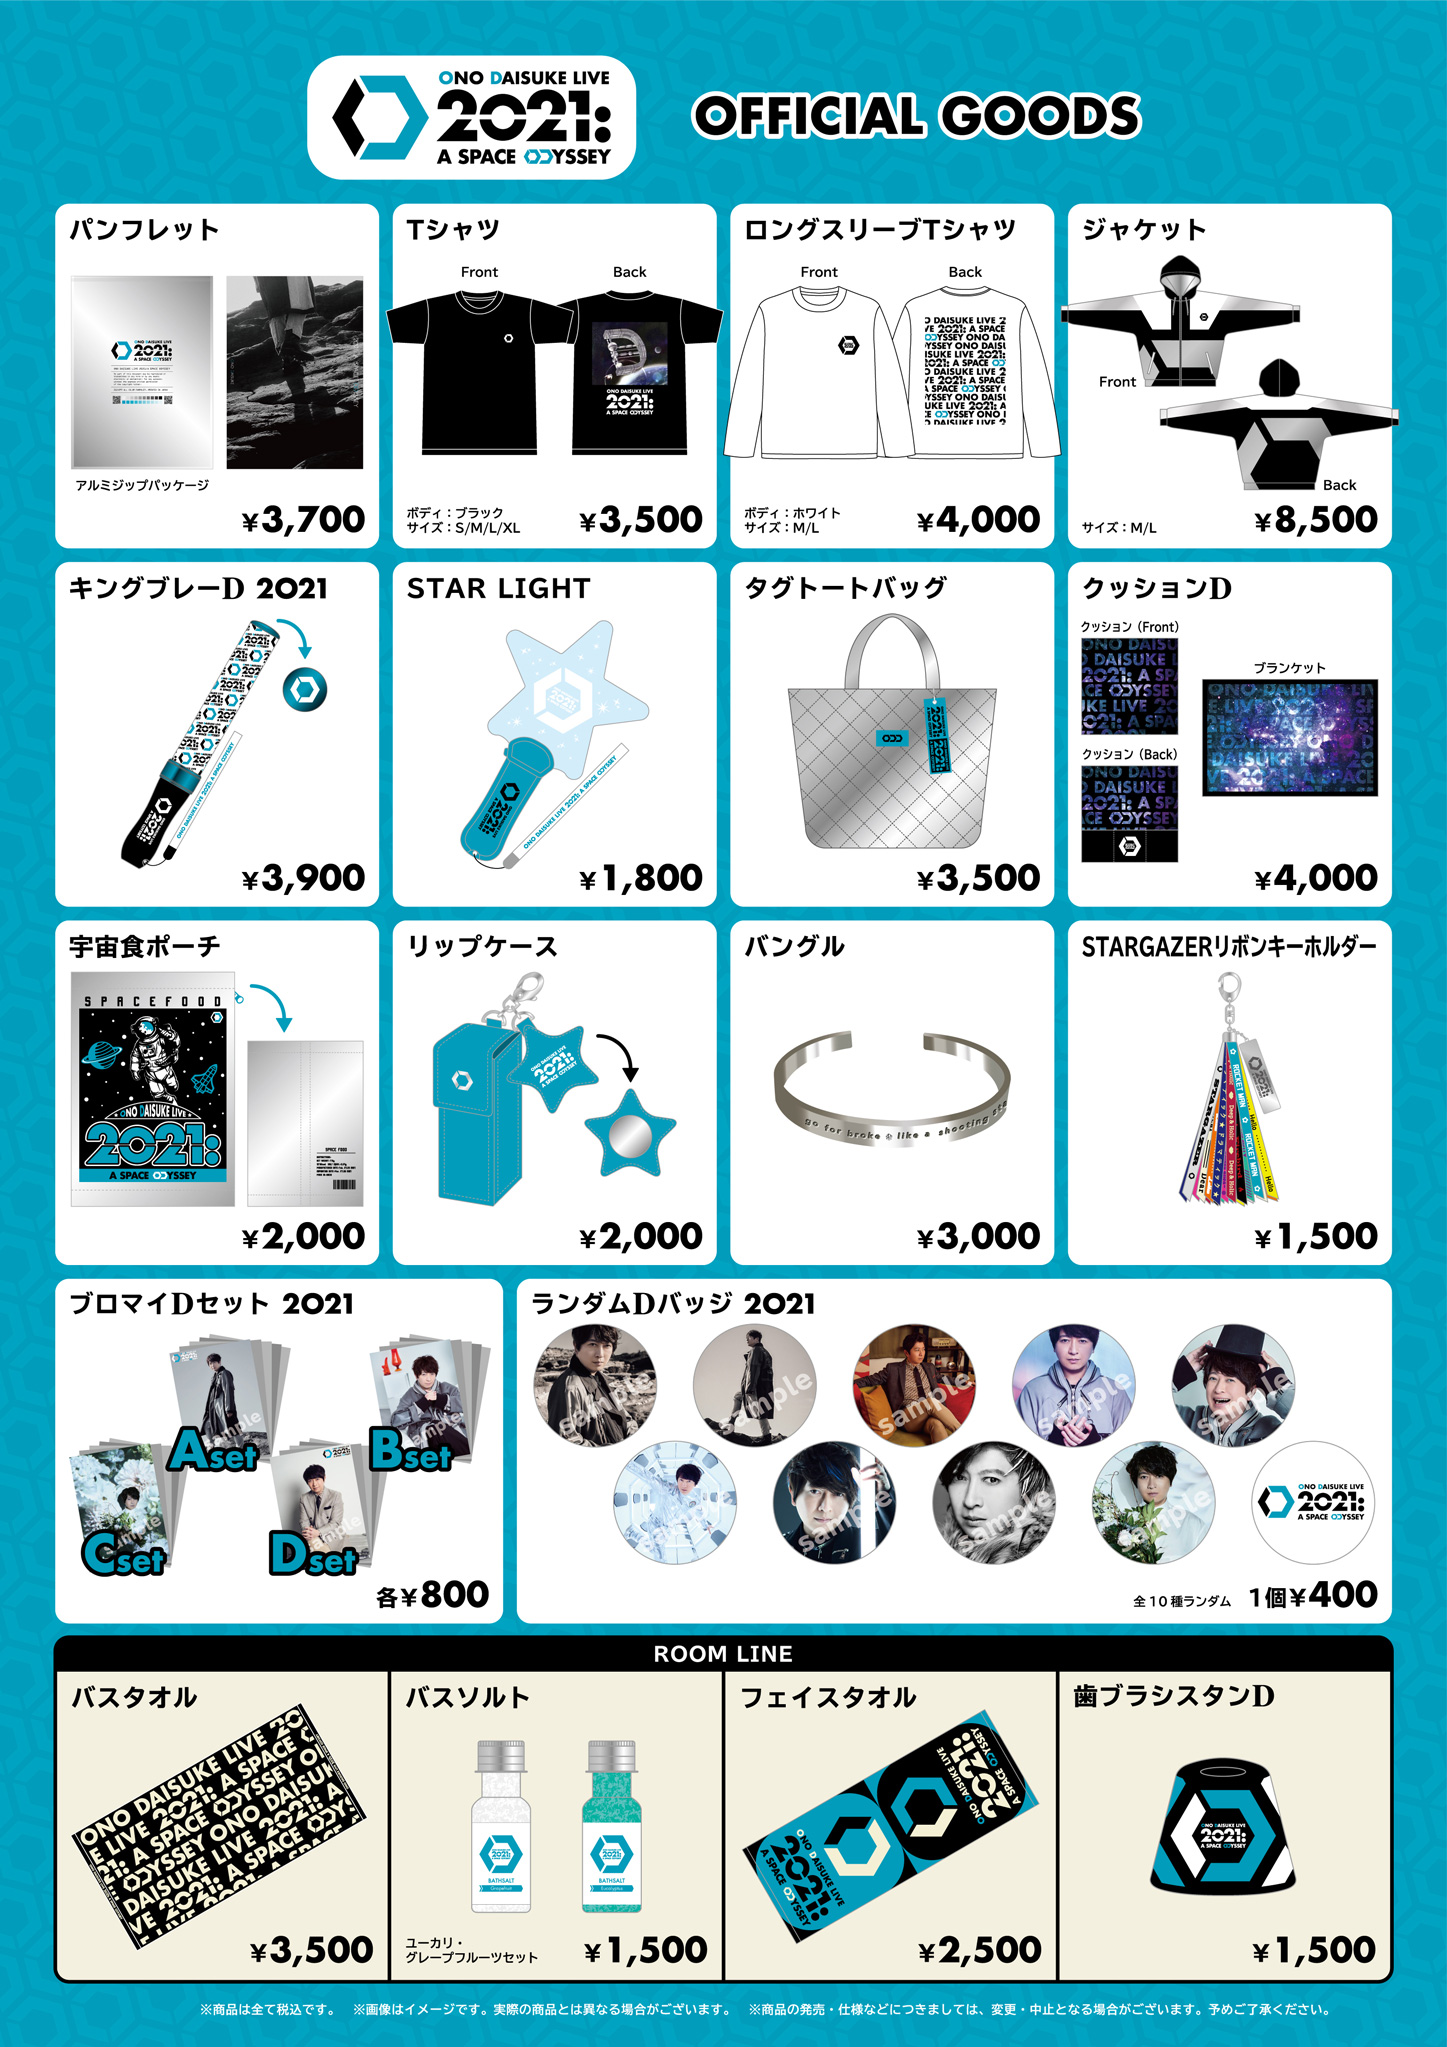 210210_ONOD_2021_aso_goods.jpg